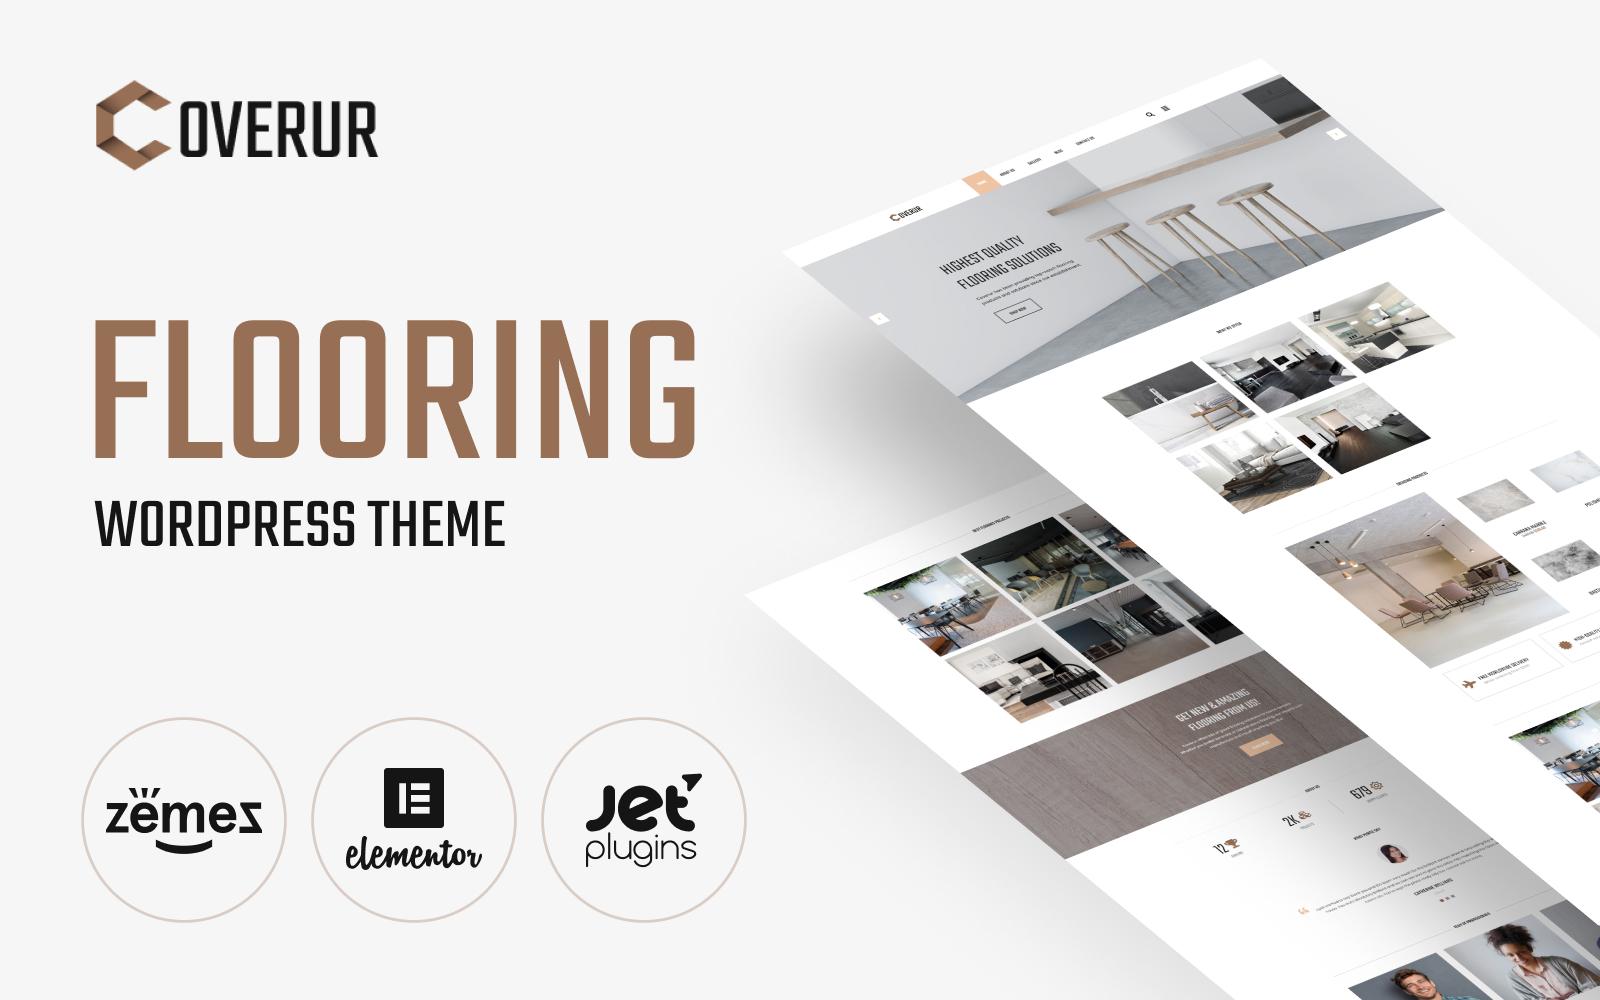 """Coverur - Flooring Company Multipurpose Minimal Elementor"" - адаптивний WordPress шаблон №81169"